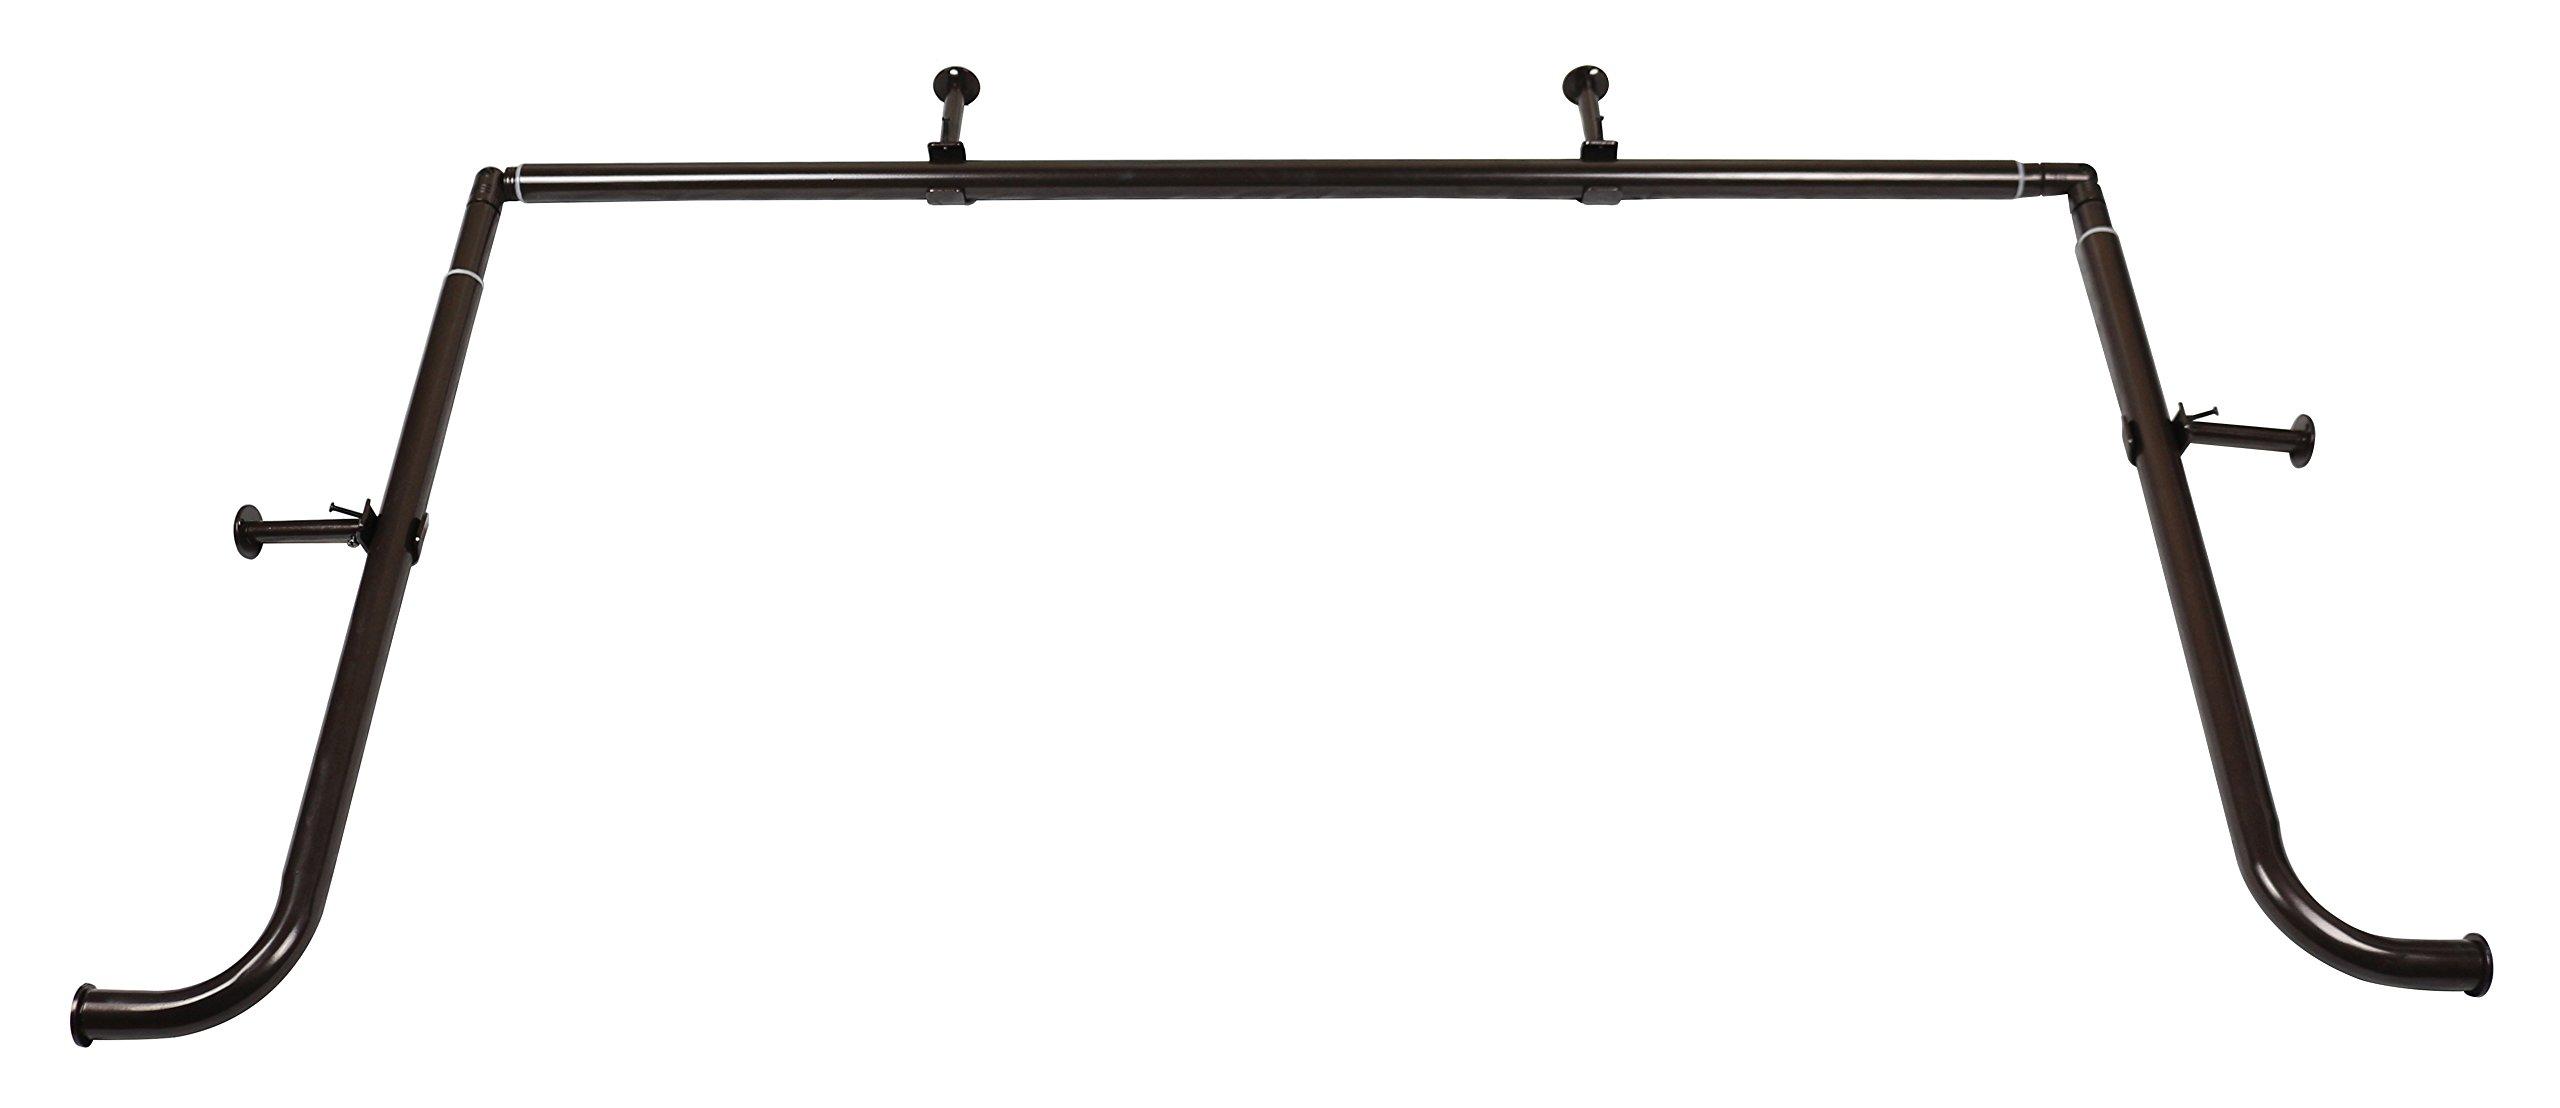 Meriville 1-Inch Diameter Bay Window Curtain Rod Set for Bayview Windows, Oil-Rubbed Bronze by MERIVILLE